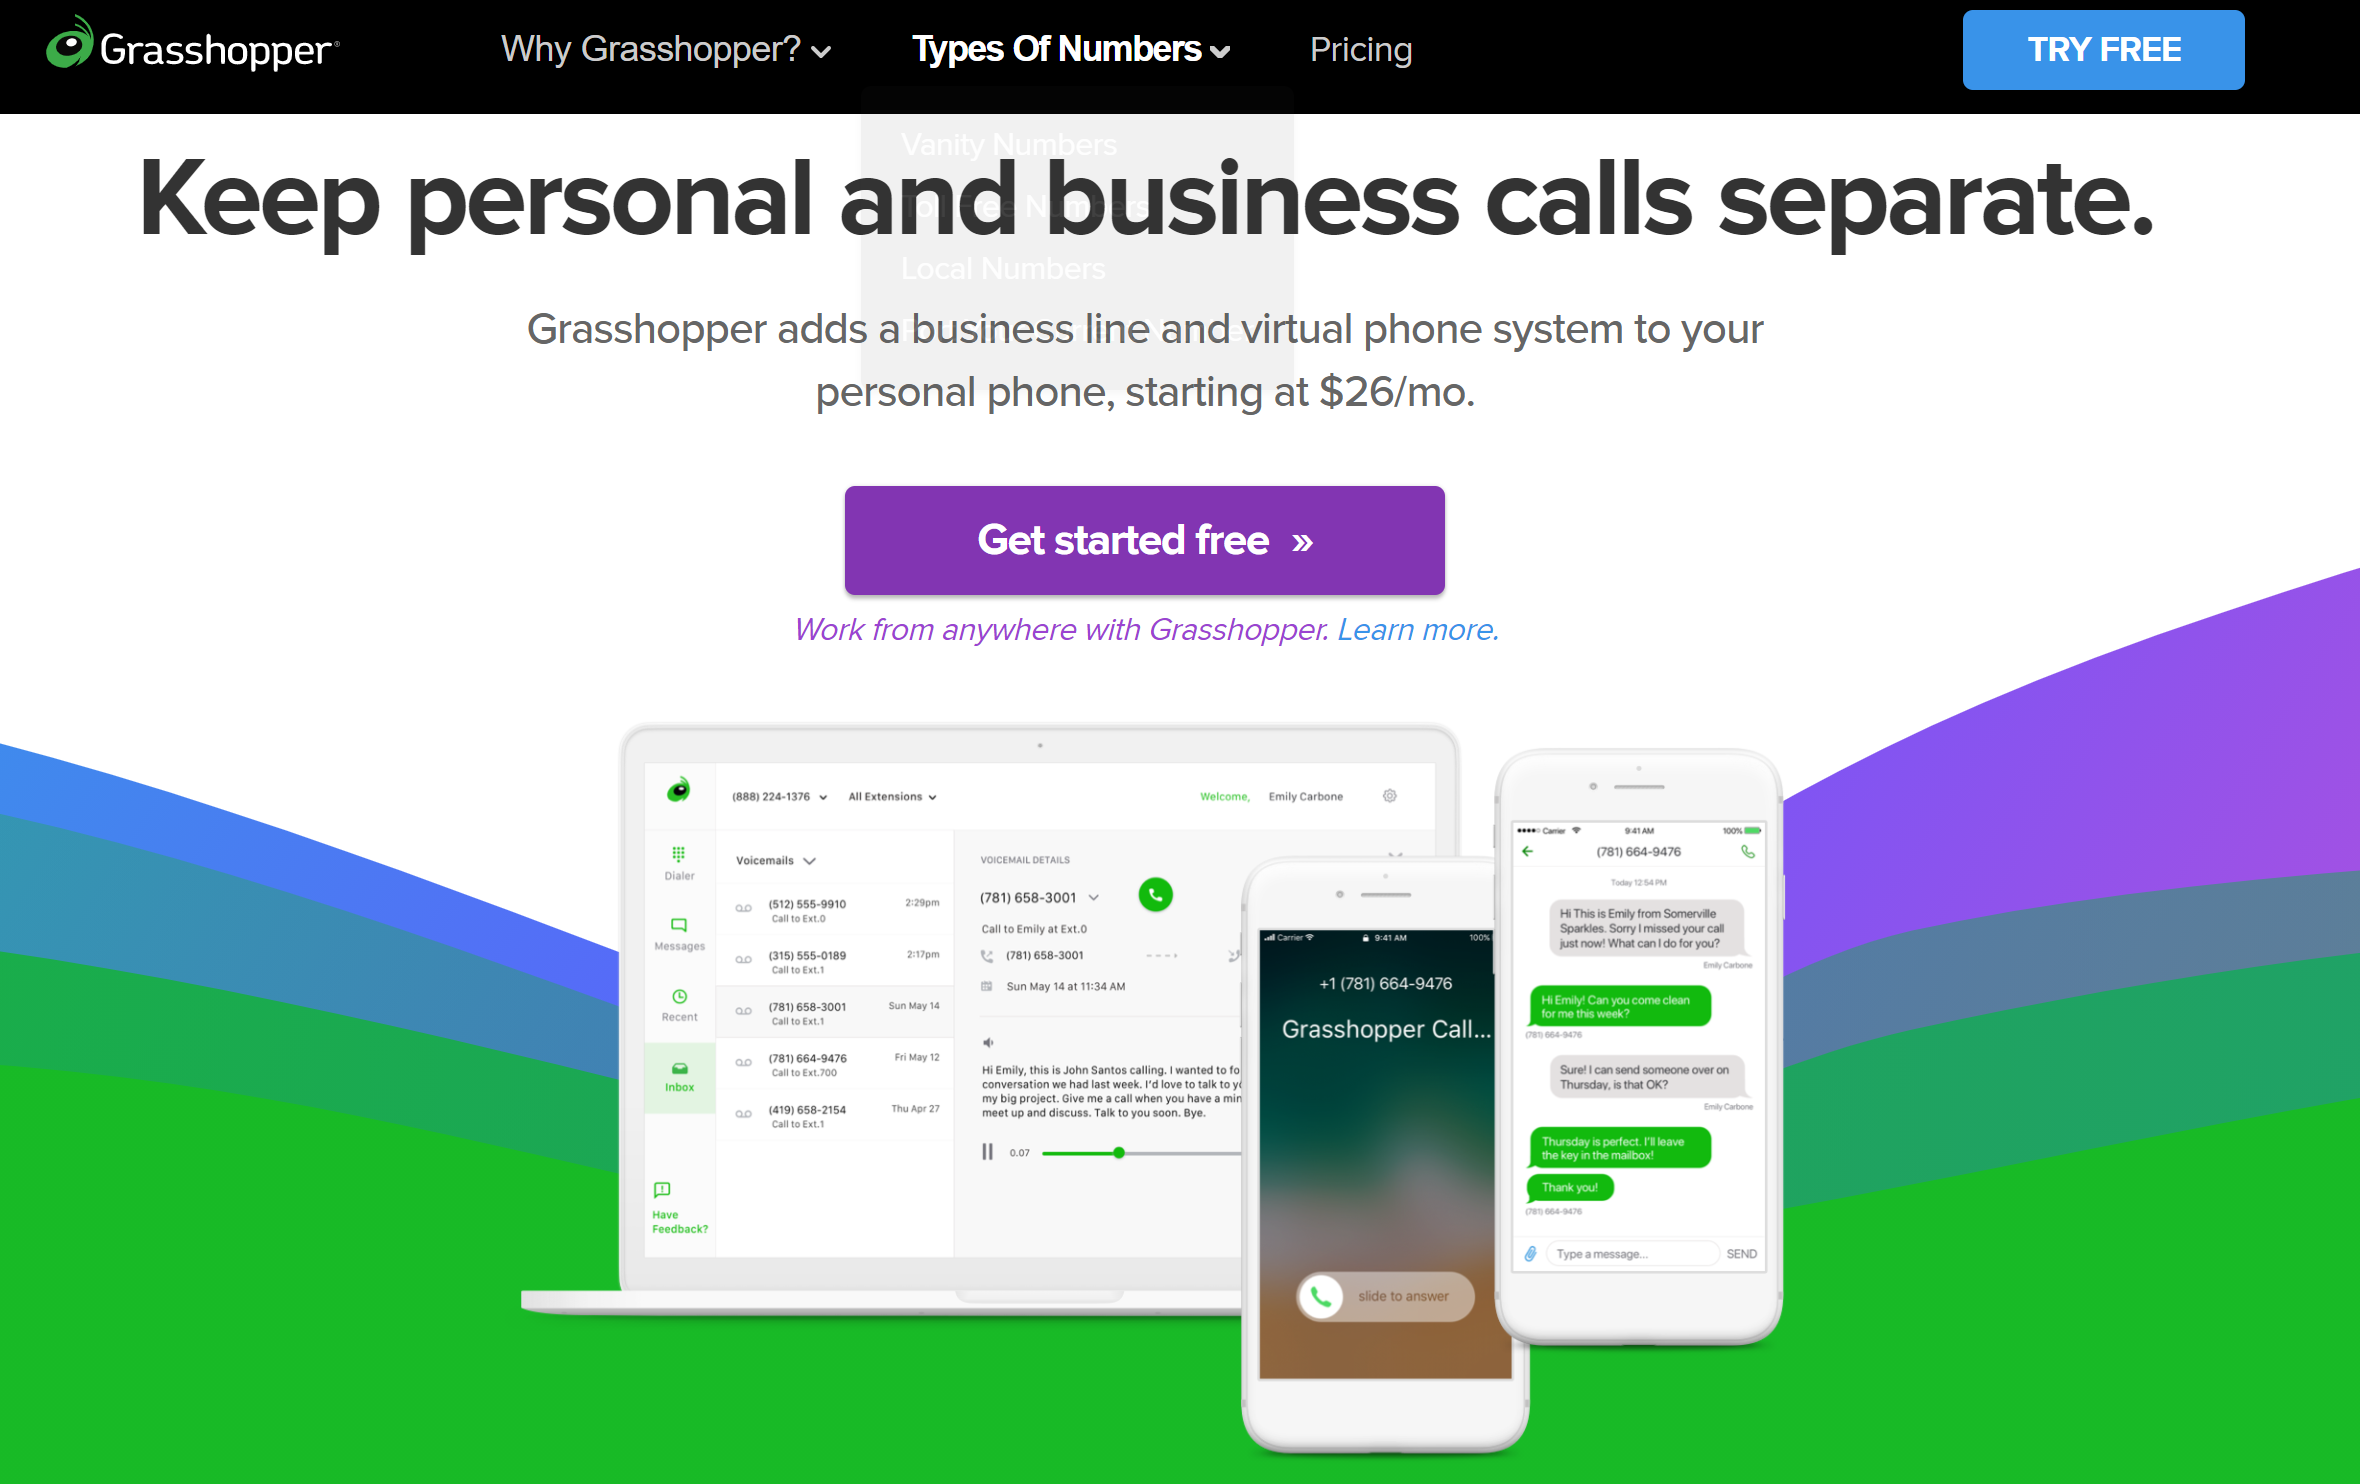 Grasshopper phone service reviews